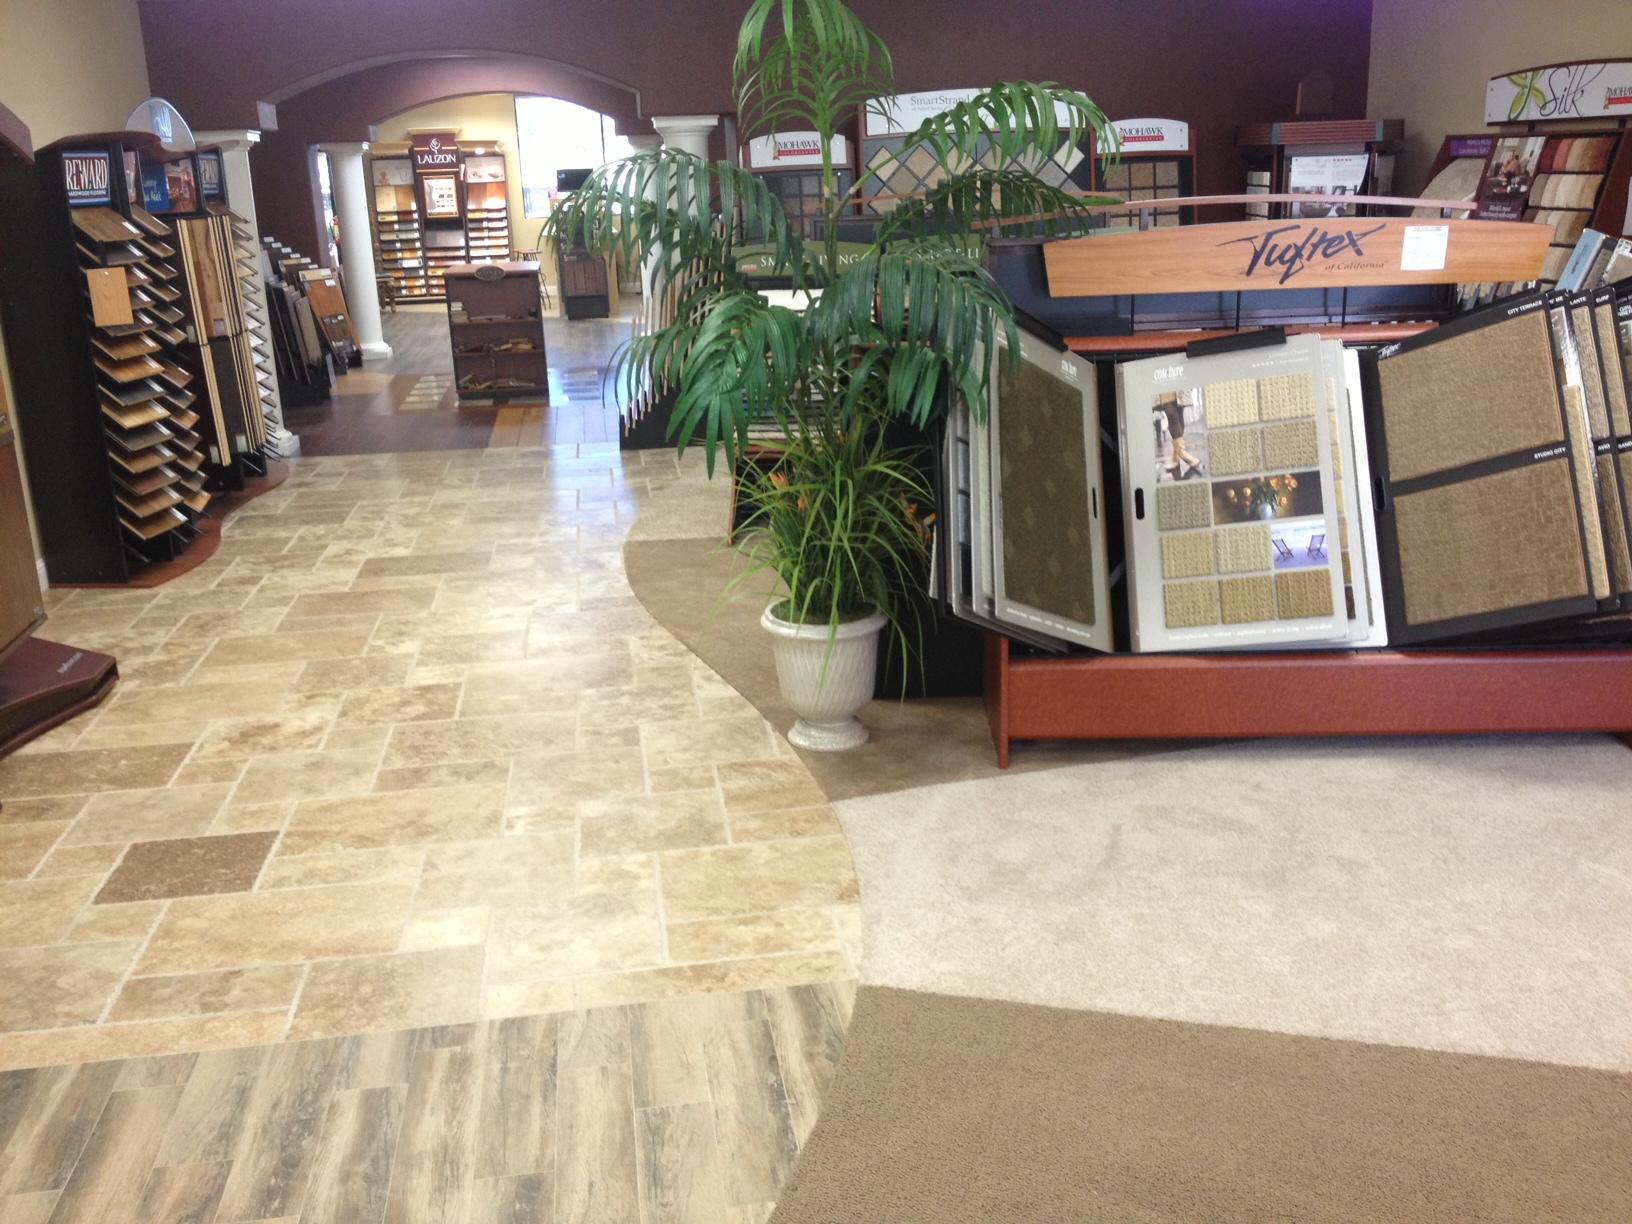 Central Valley Floor Design - 4921 Robert J Mathews Pkwy, El Dorado Hills, CA 95762